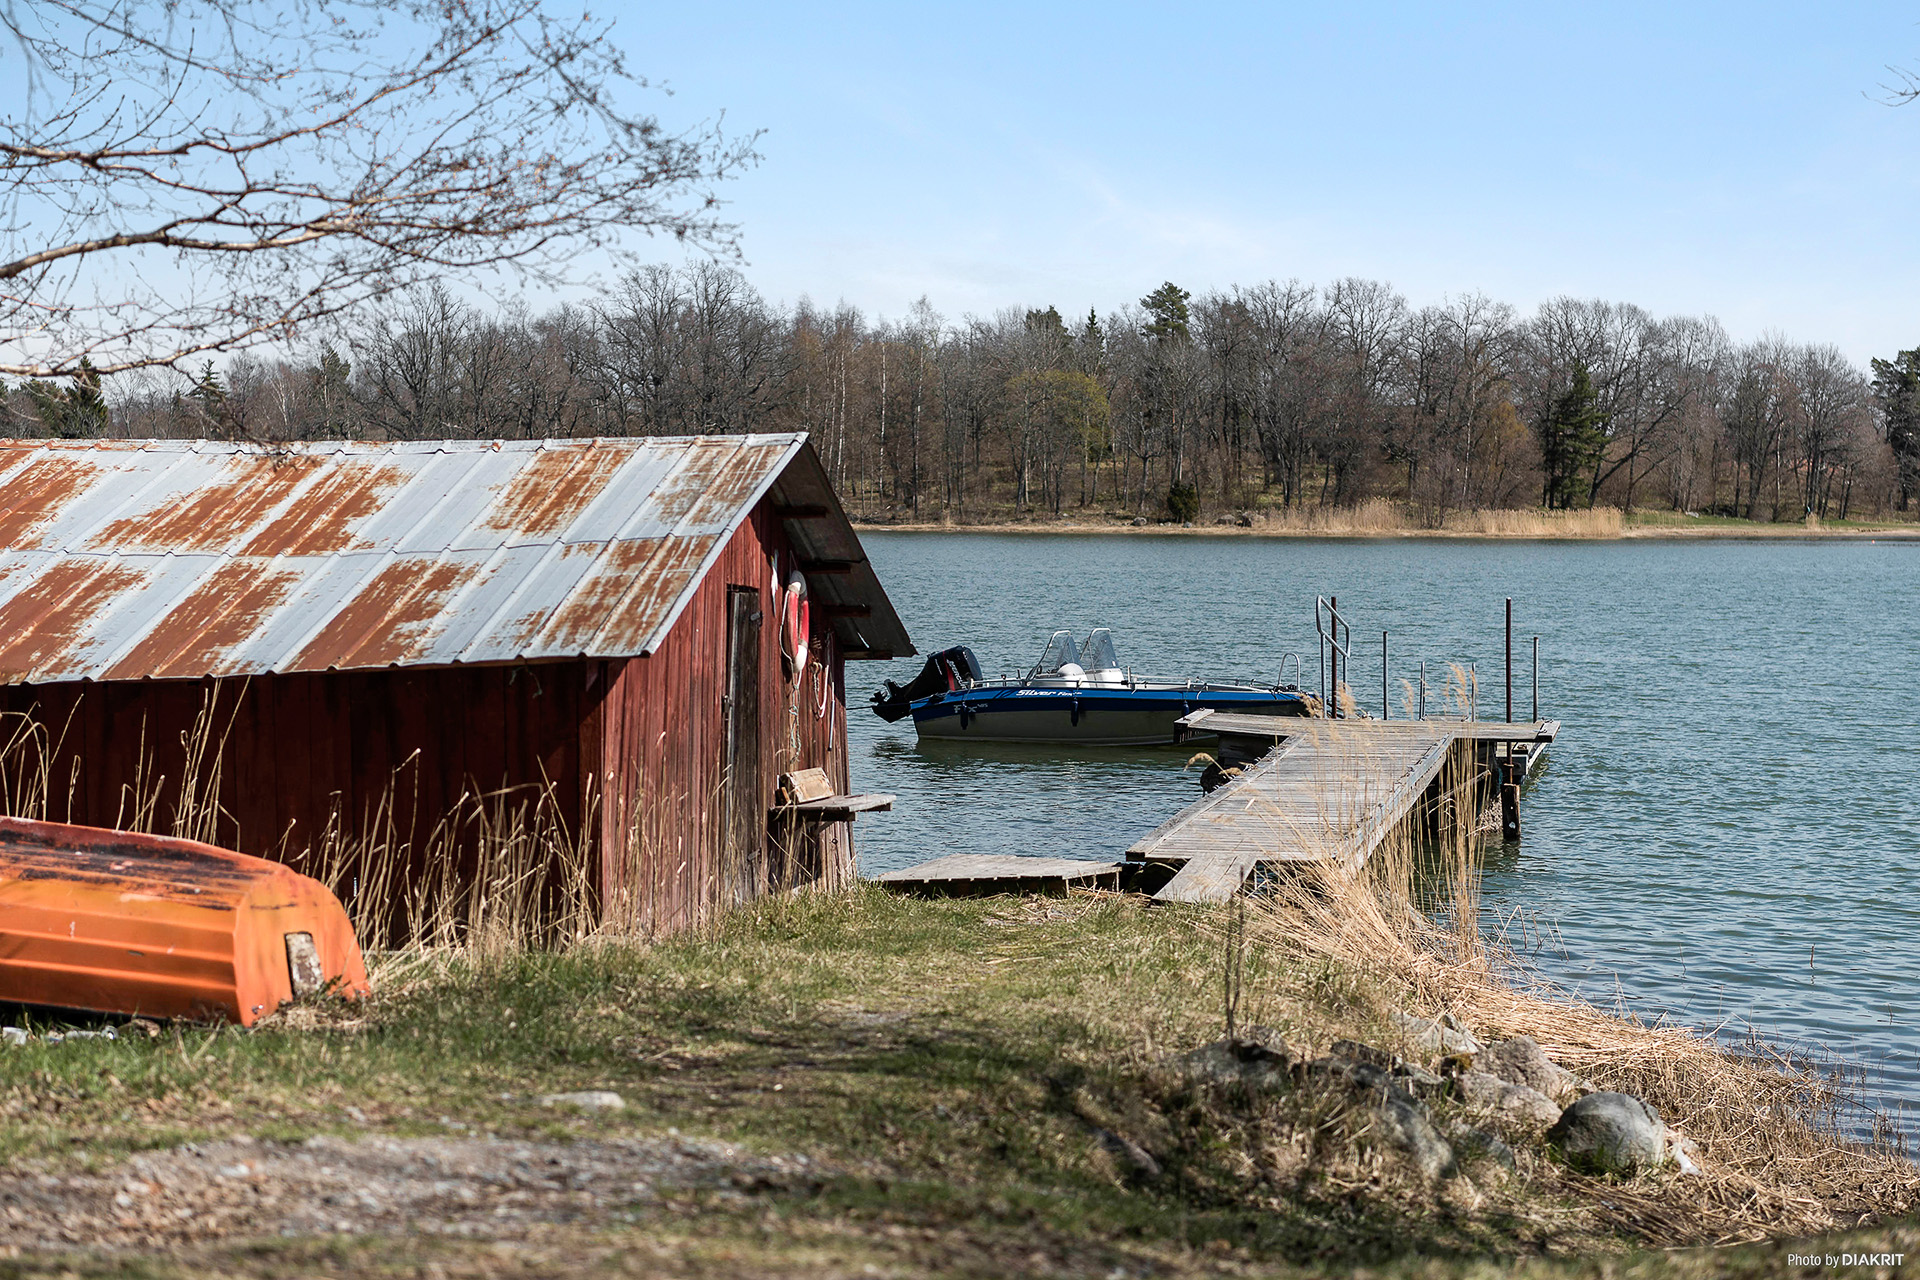 Gammalt båthus precis vid vattnet